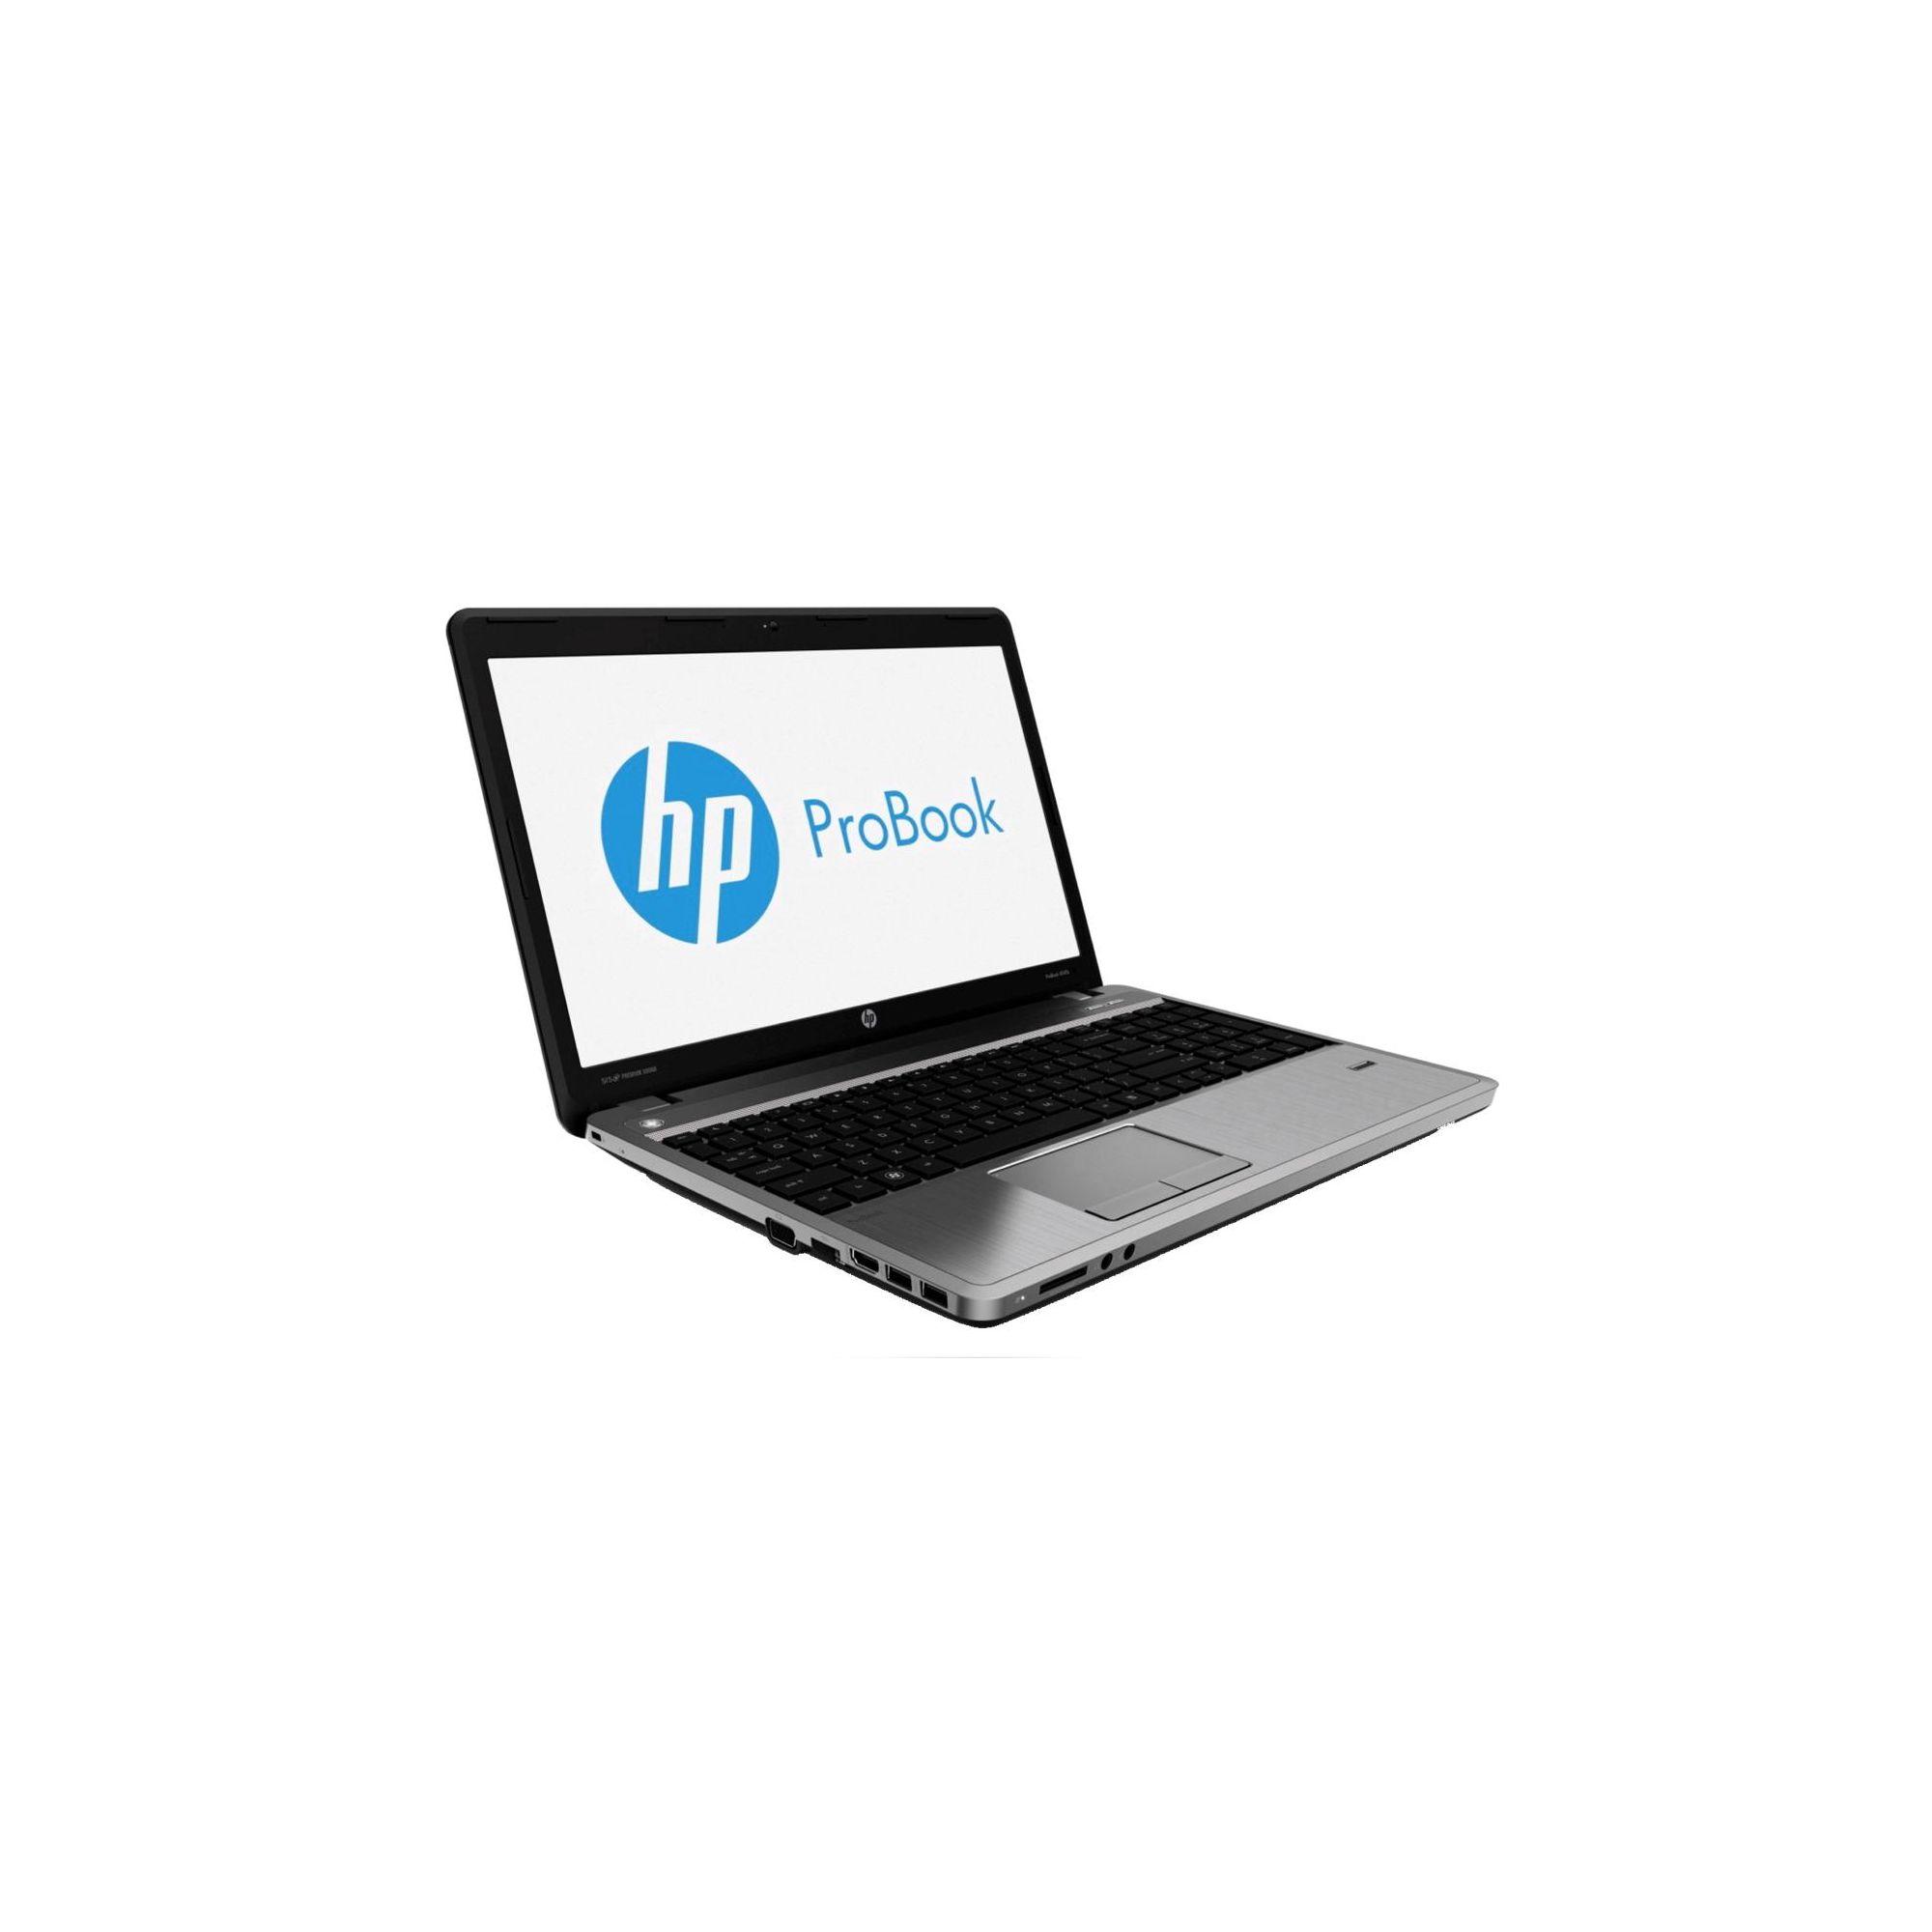 HP ProBook 4540s (15.6 inch) Notebook Core i3 (3110M) 2.4GHz 4GB 500GB DVD±RW SM DL WLAN BT Webcam Windows 8 Pro 64-bit (HD Graphics 4000) at Tesco Direct